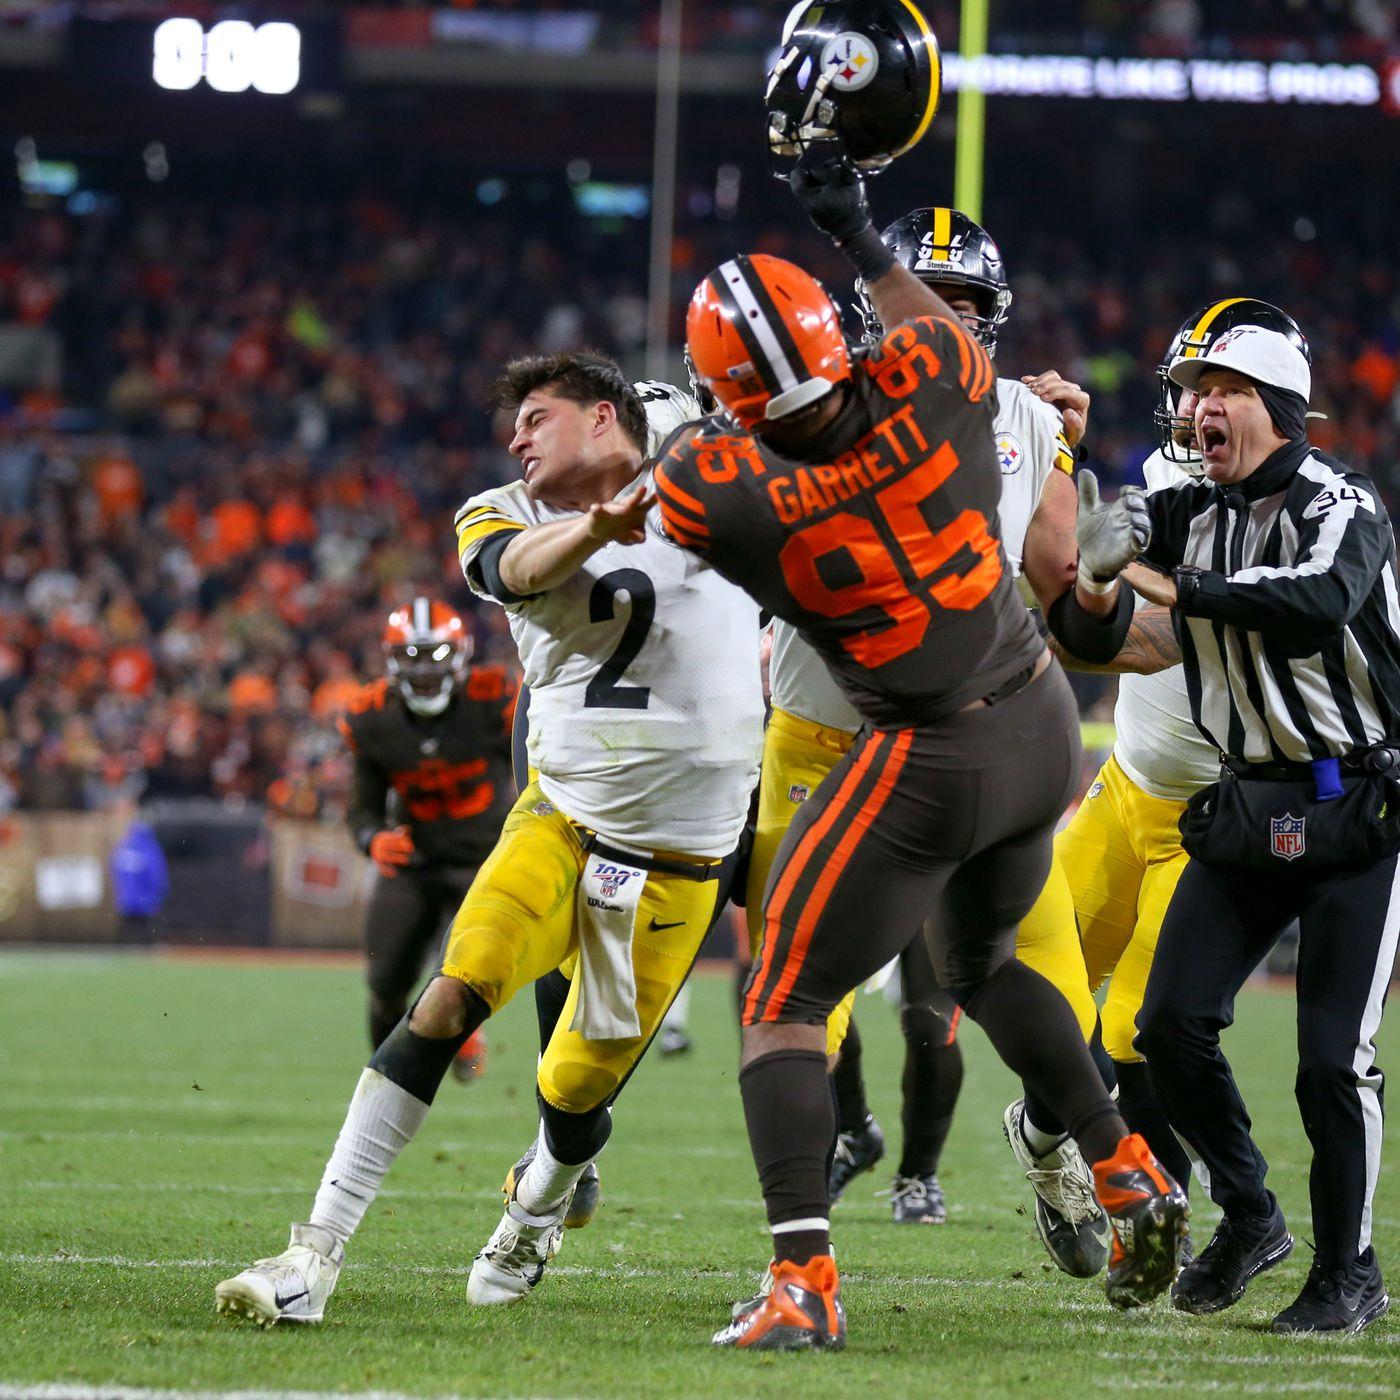 The Myles Garrett vs. Mason Rudolph Steelers Browns fight ...